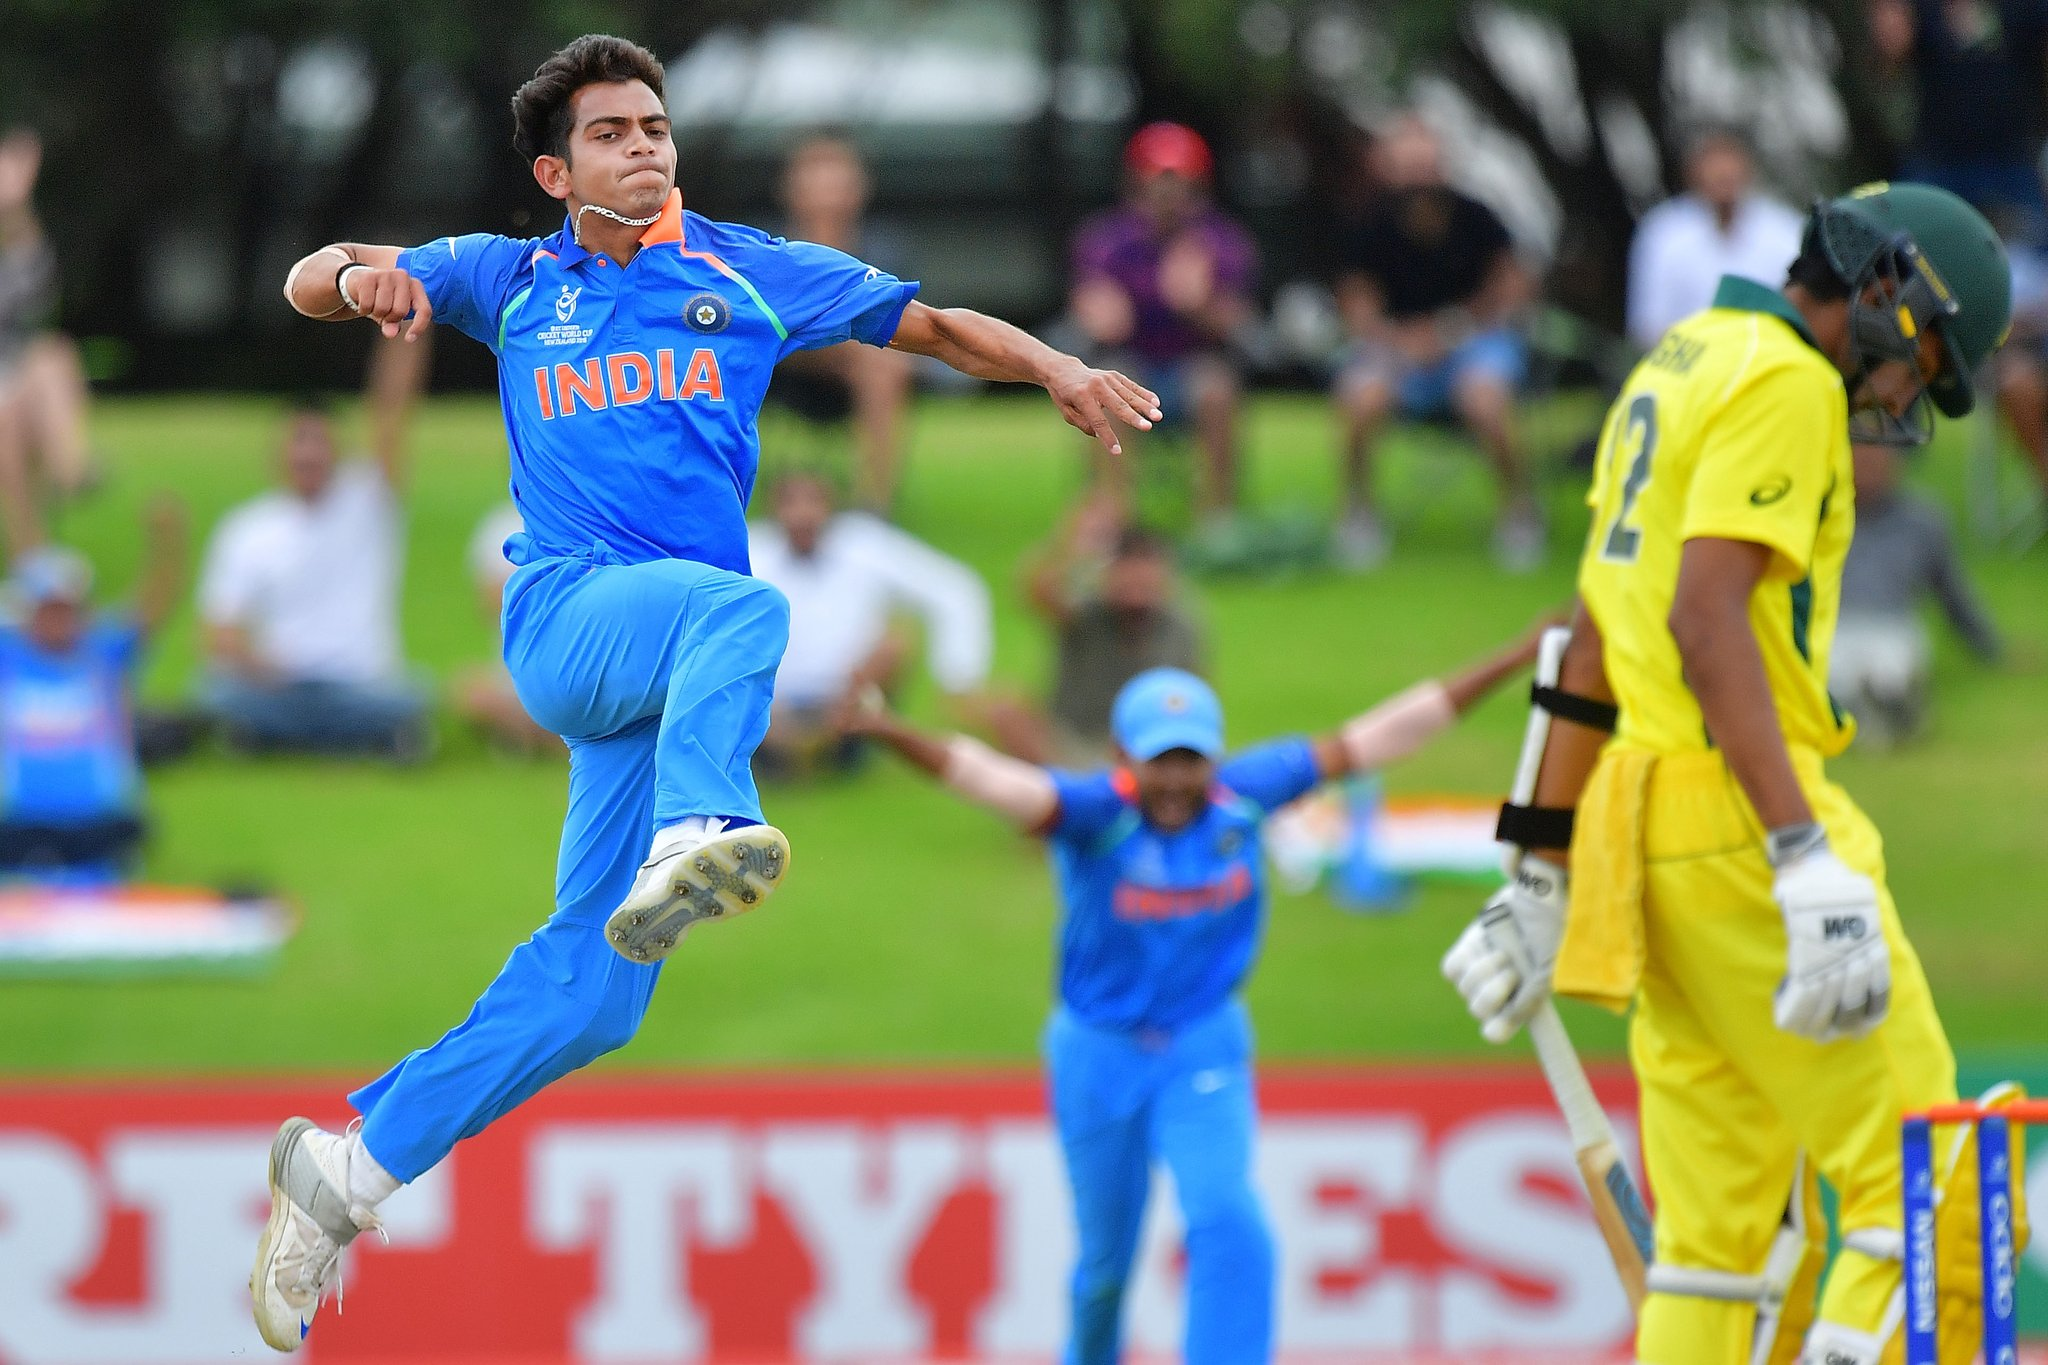 ICC Under-19 Cricket world cup 2018 photos free download